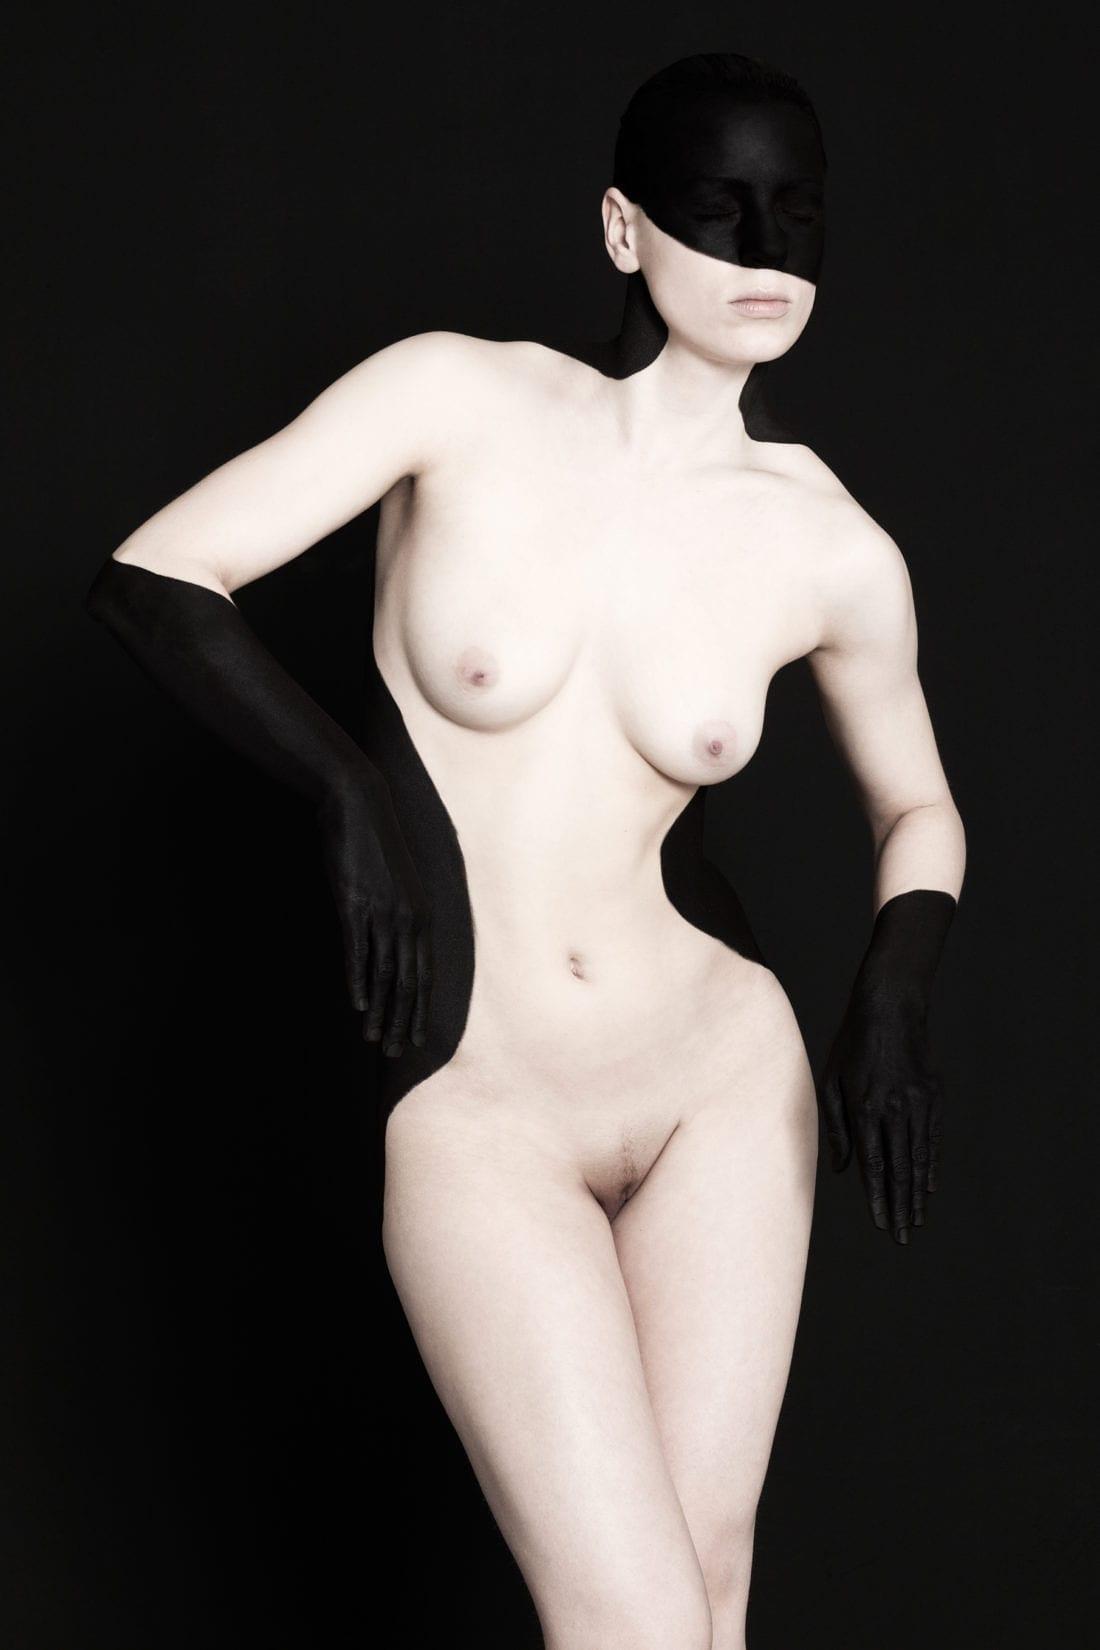 Black on Black - Free Work - Nudes© brenda de vries